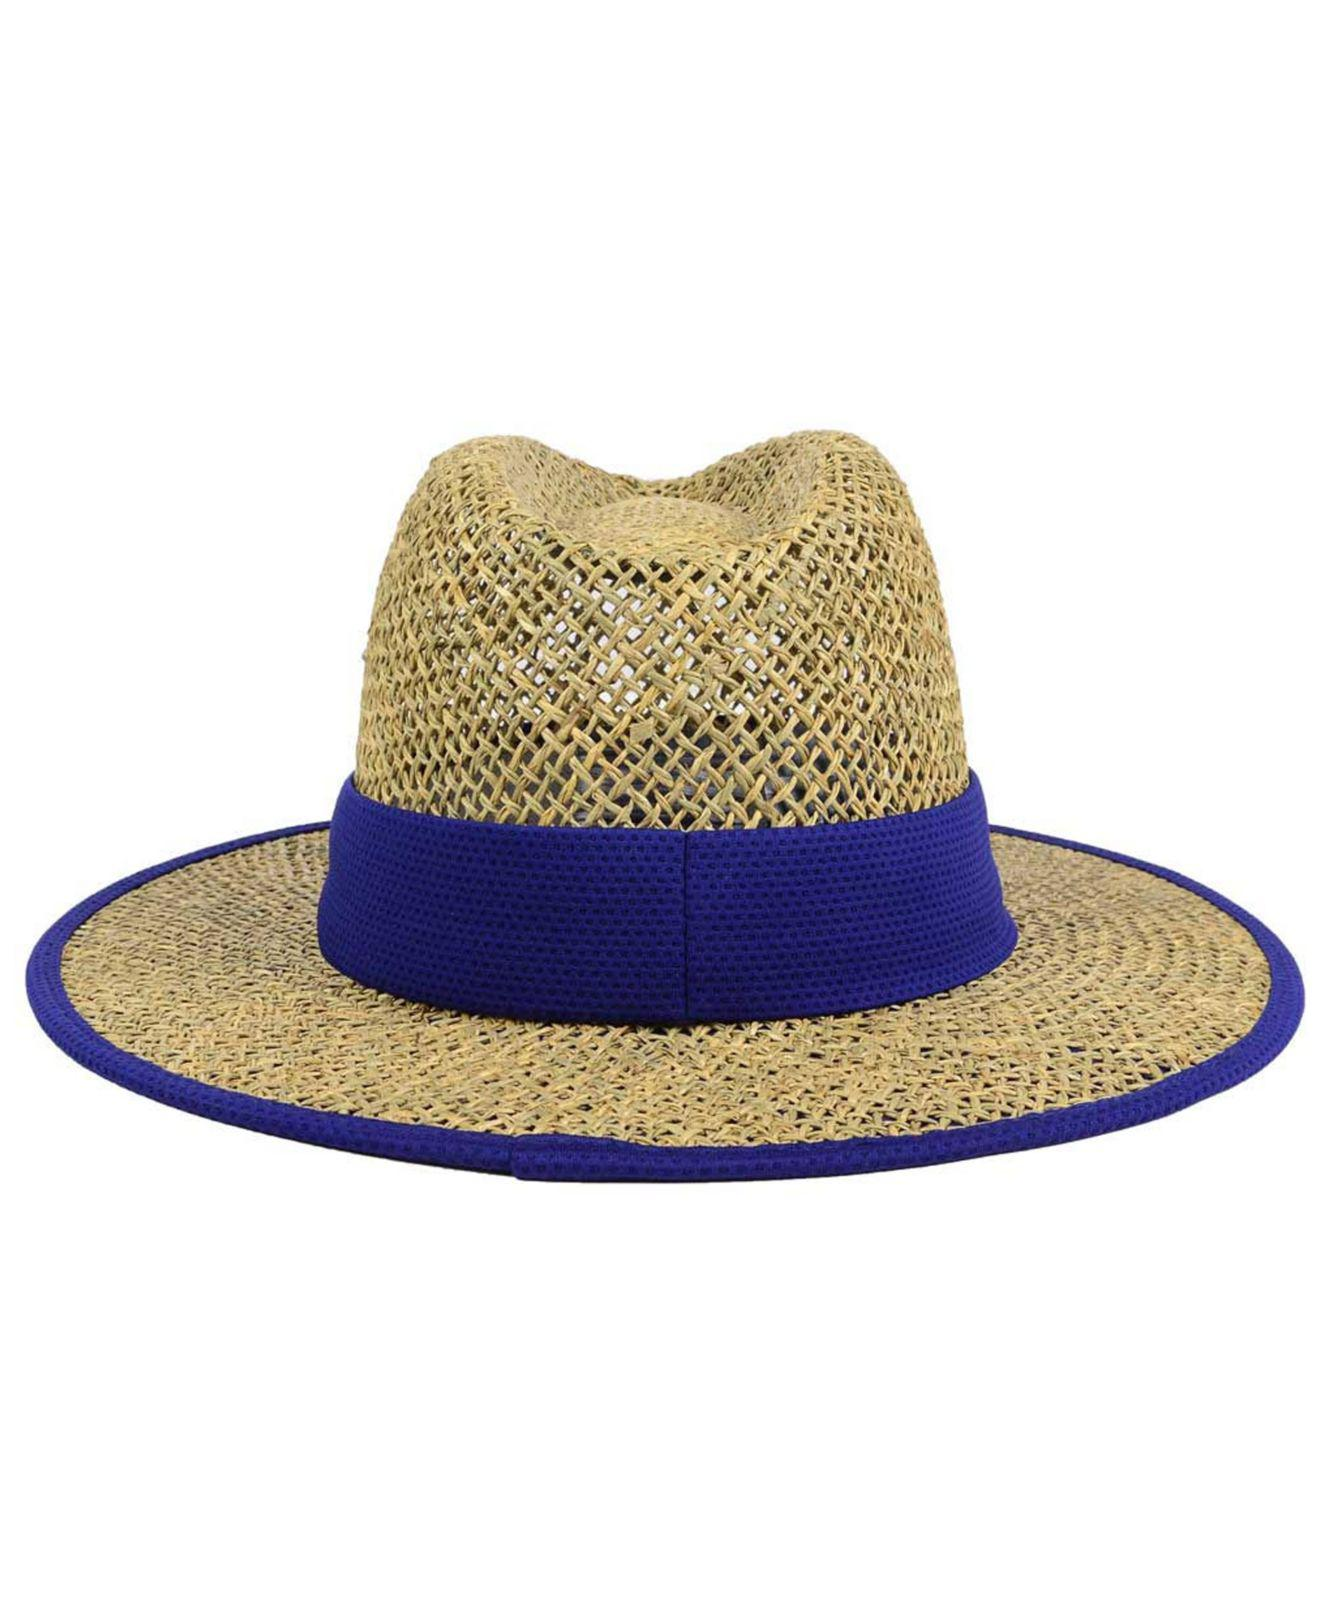 19fee272708ff9 KTZ Los Angeles Dodgers Training Straw Hat in Blue for Men - Lyst